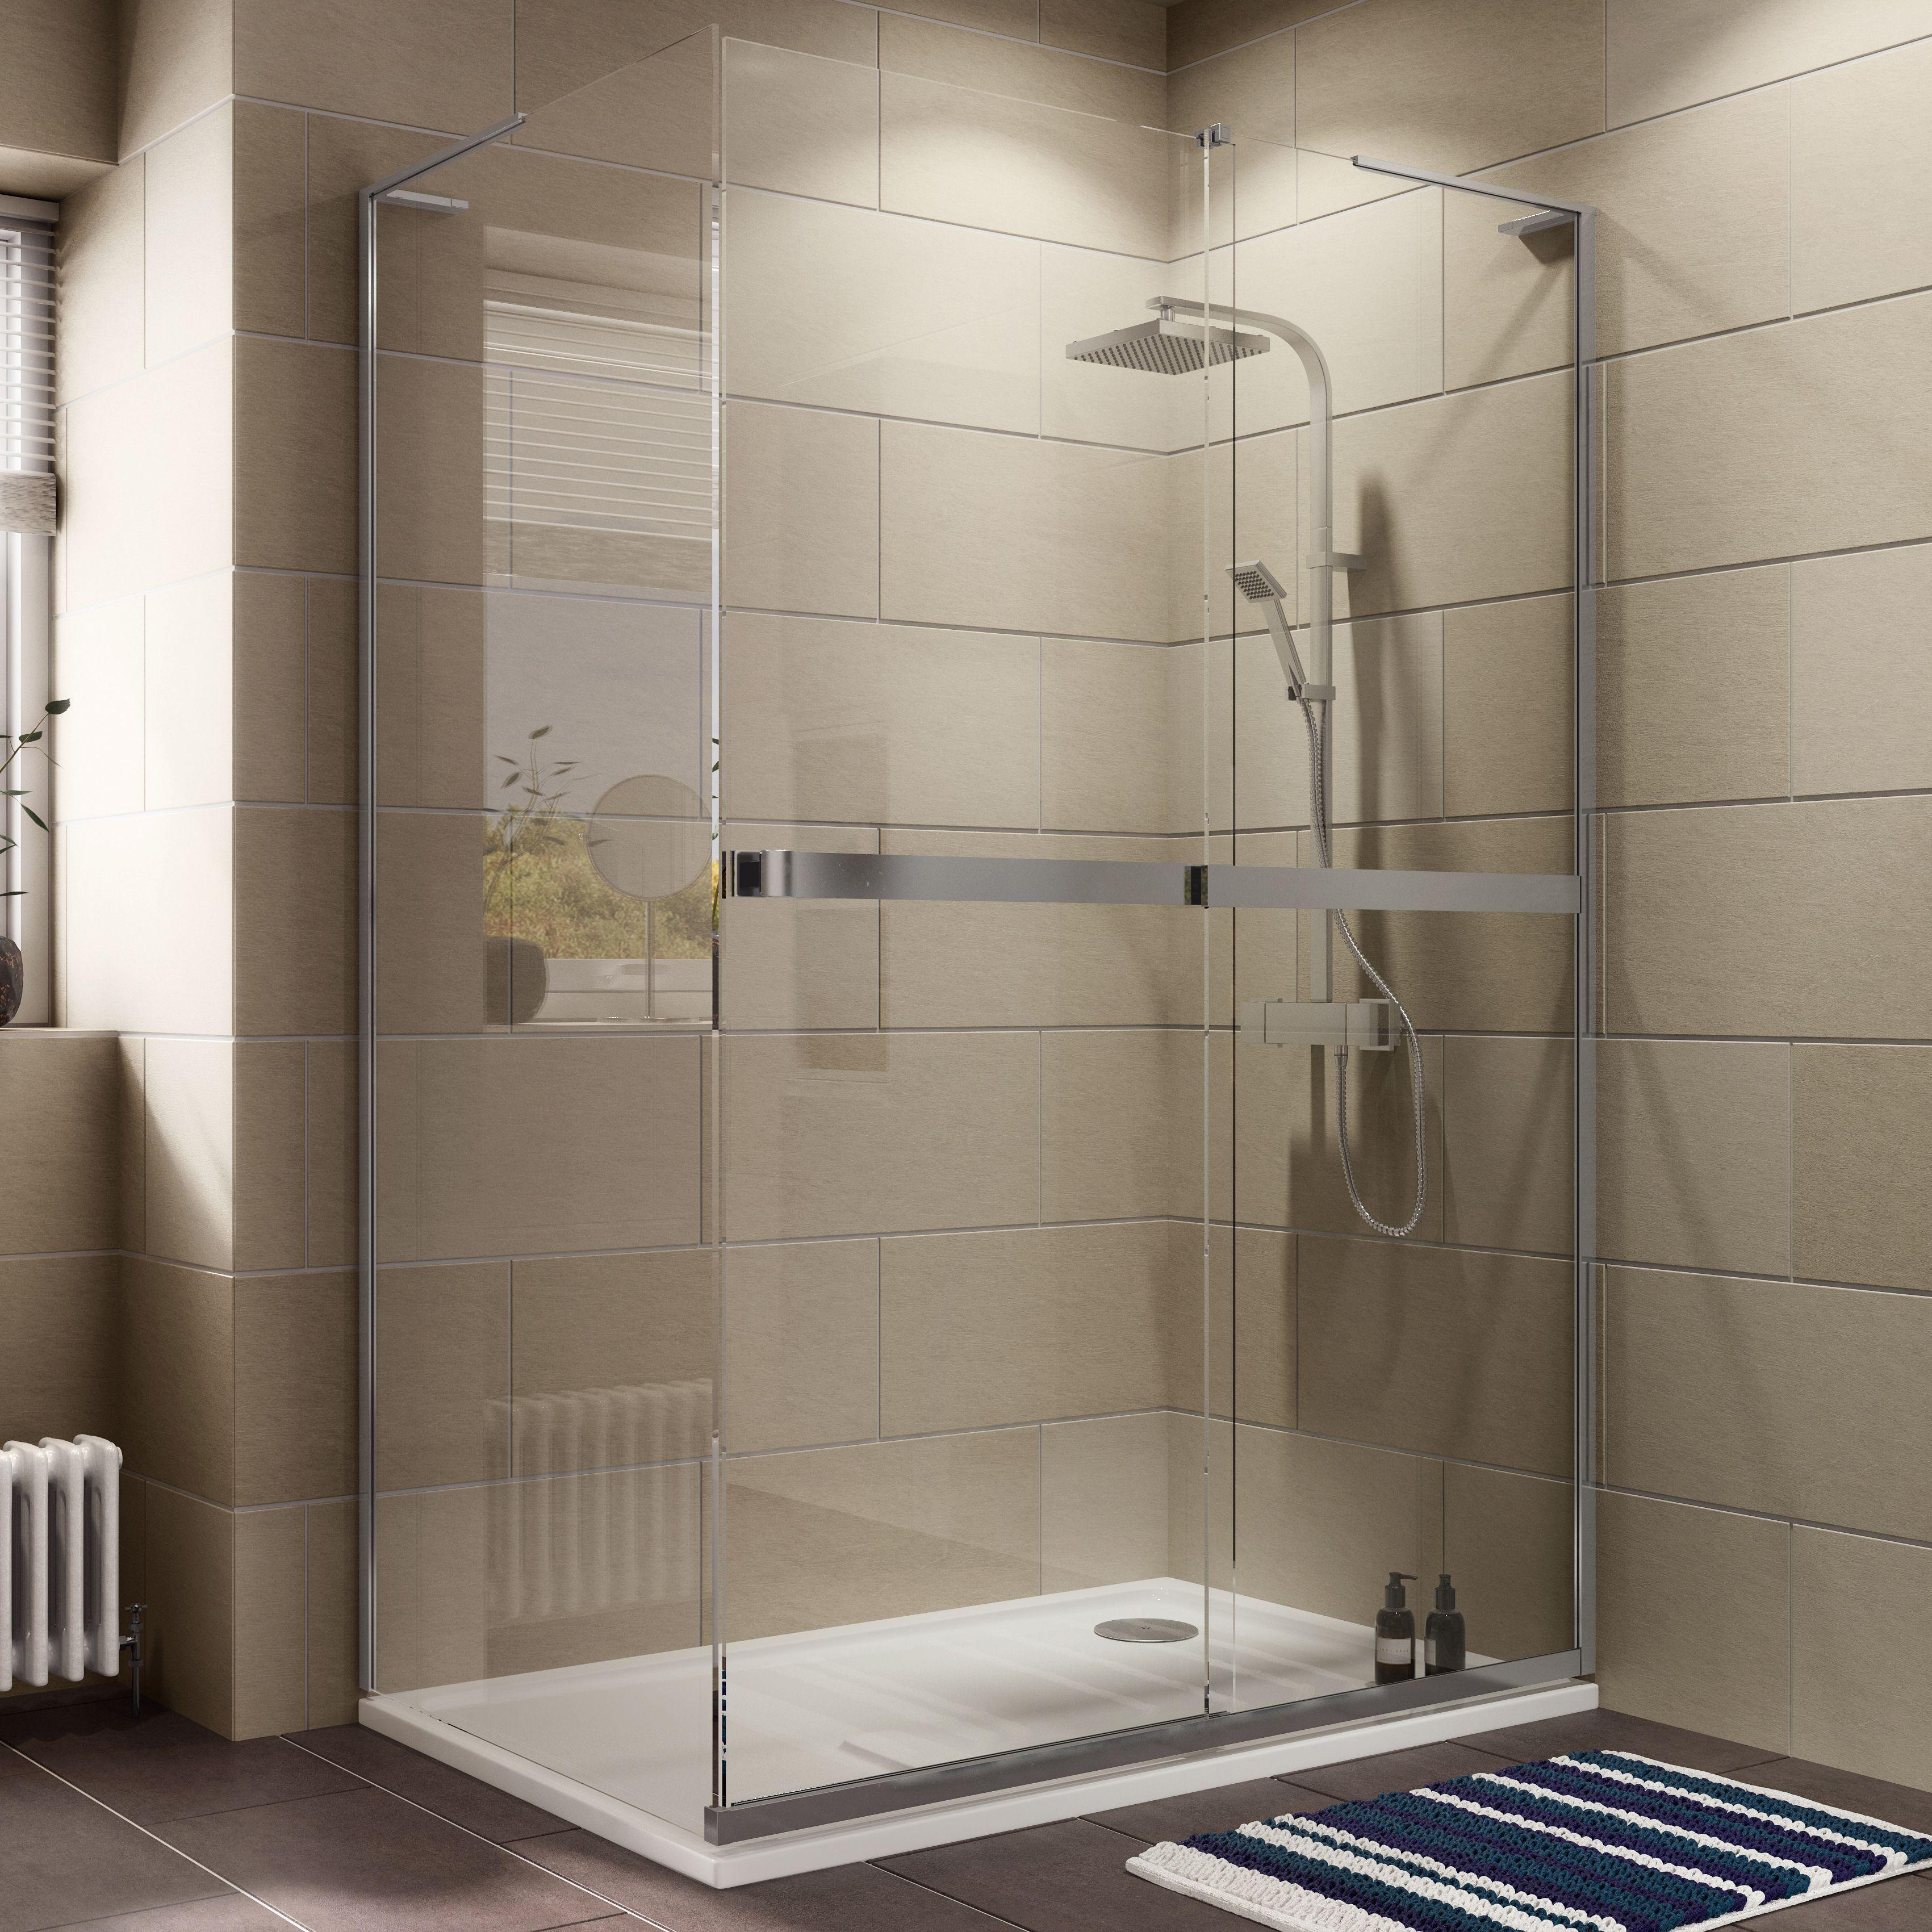 Cooke & Lewis Grandeur Rectangular RH Shower Enclosure, Tray & Waste ...